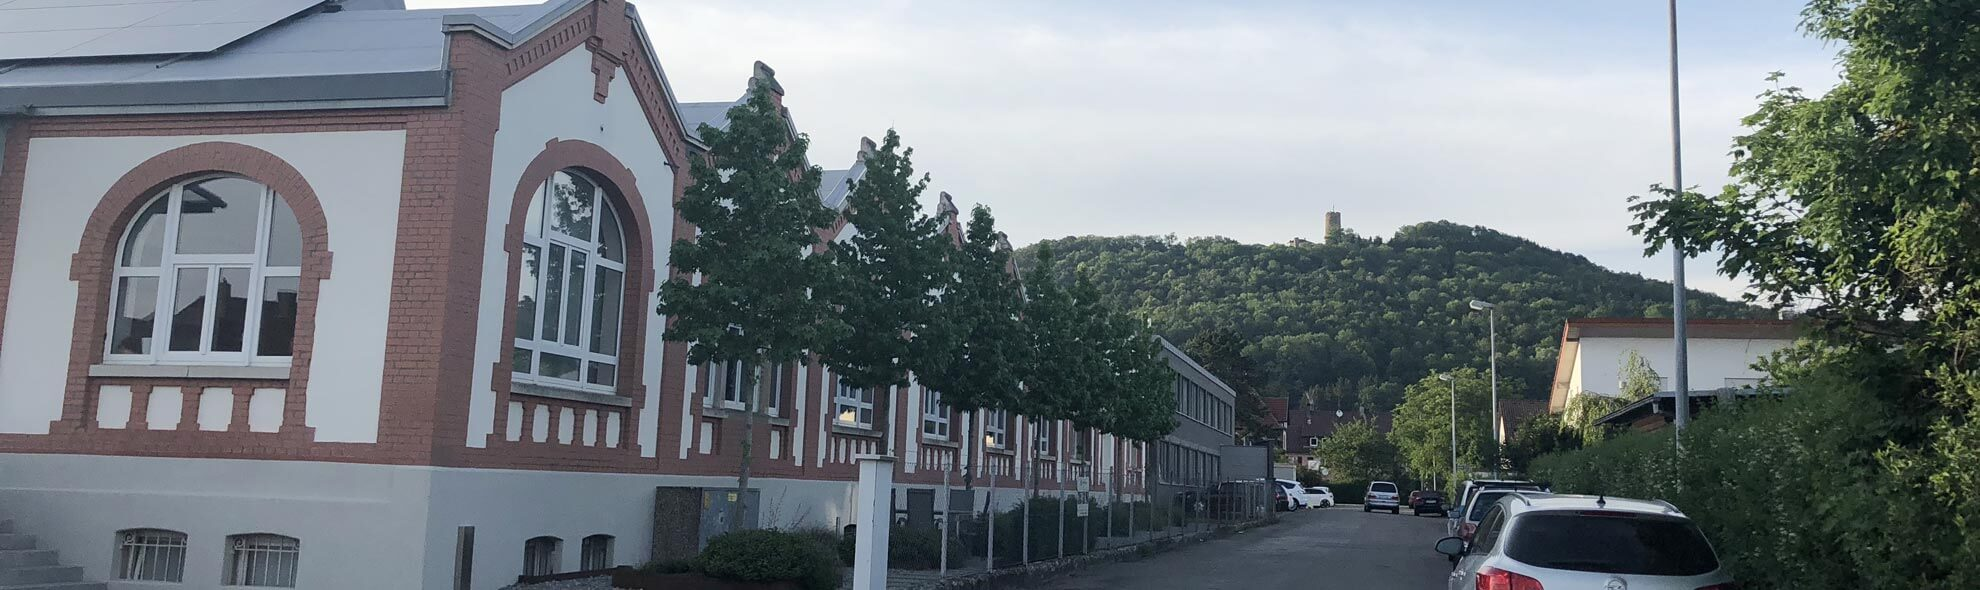 Fabrikstraße in Süßen